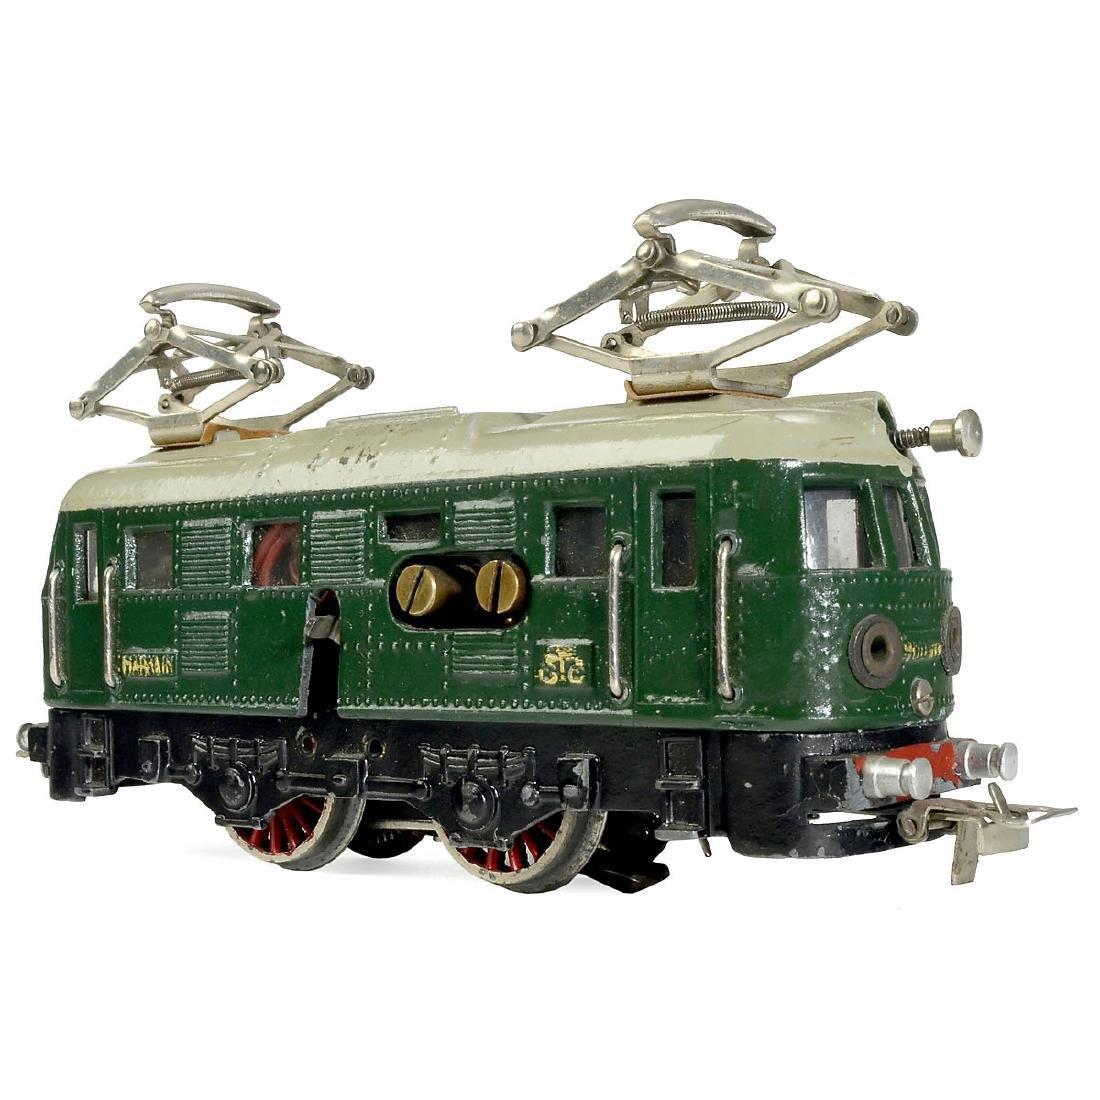 Märklin RS800 Electric Locomotive, c. 1940